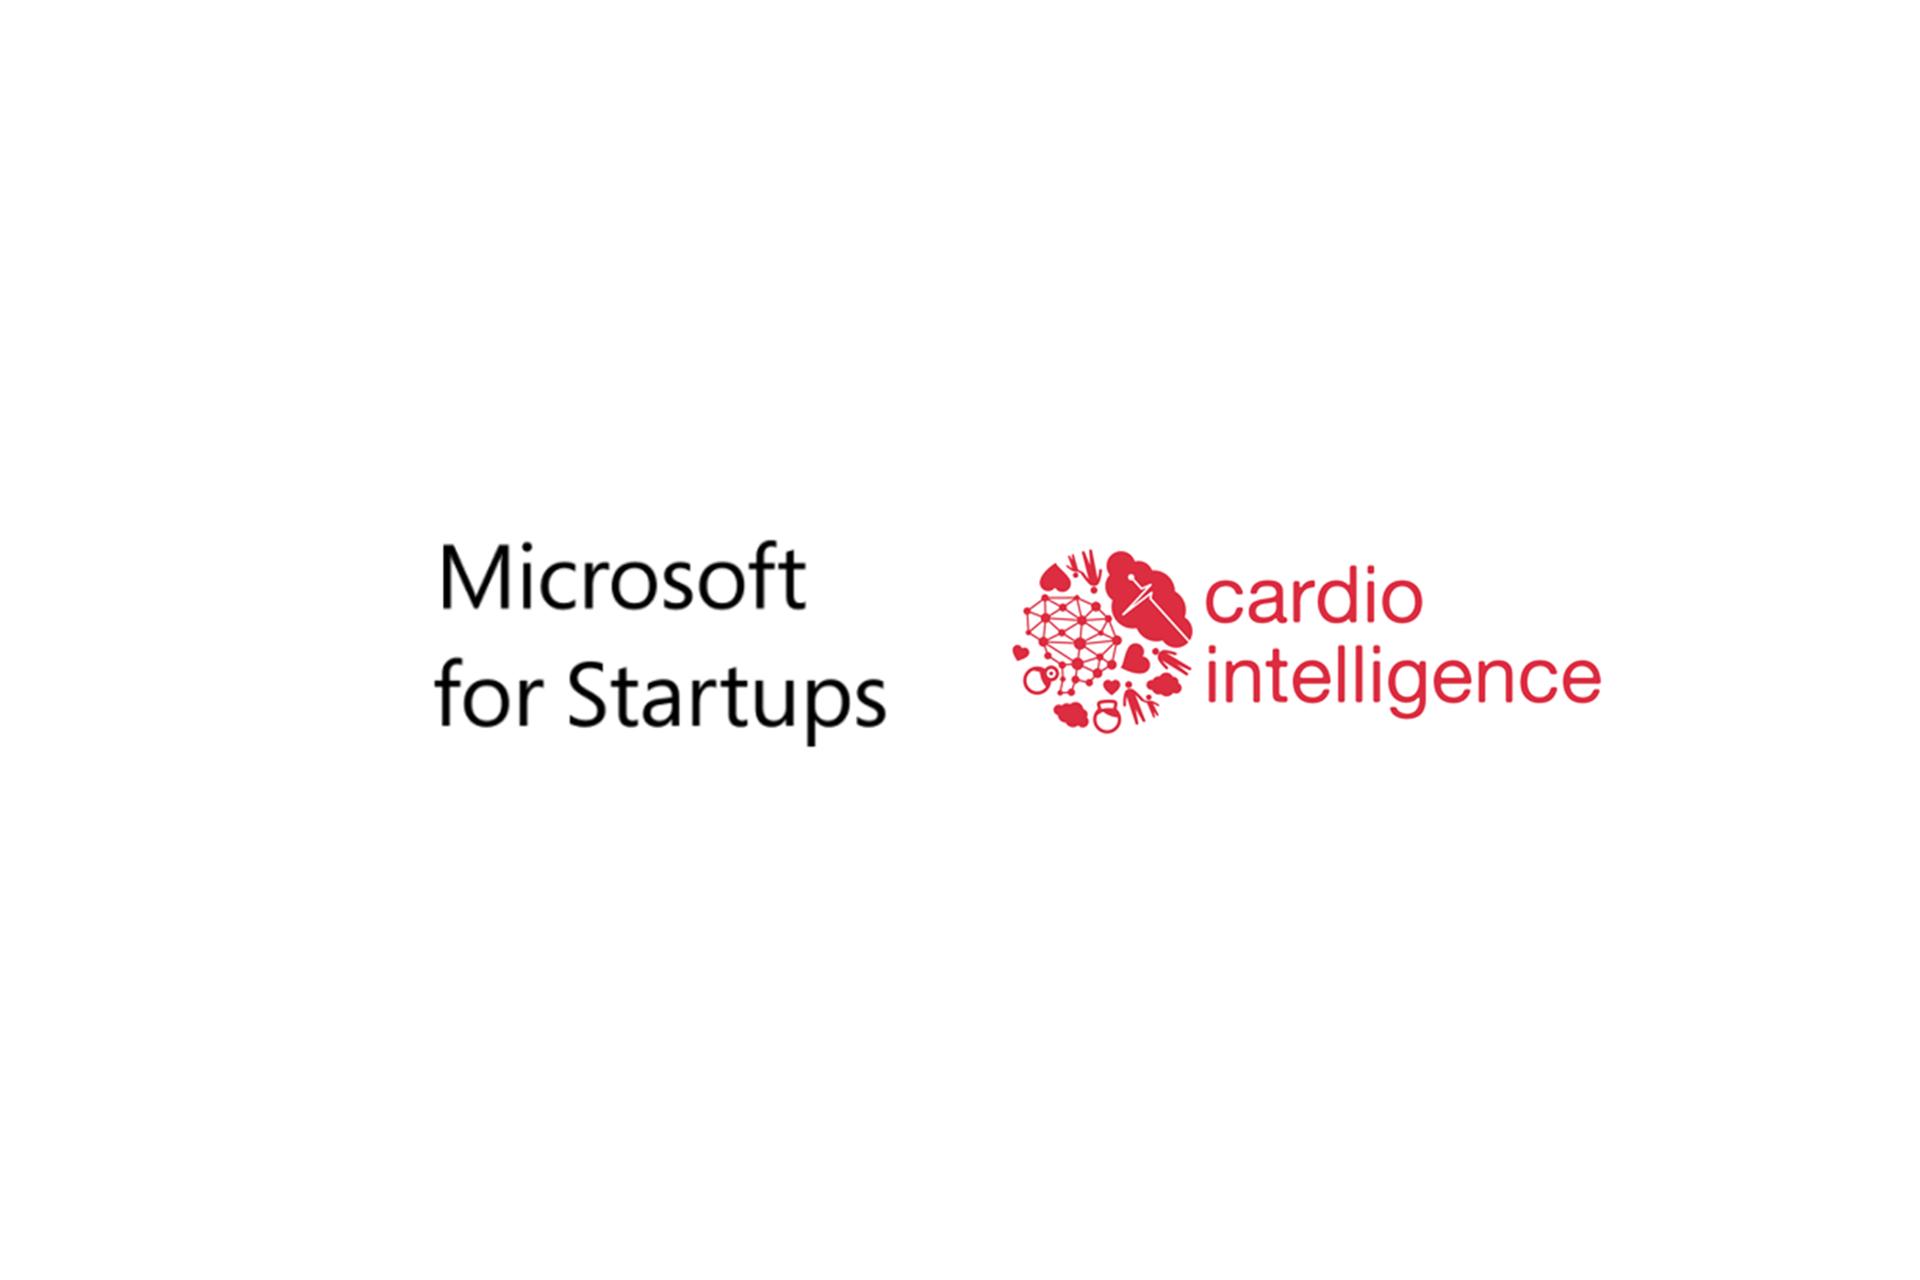 Microsoft for Startupsに選ばれました